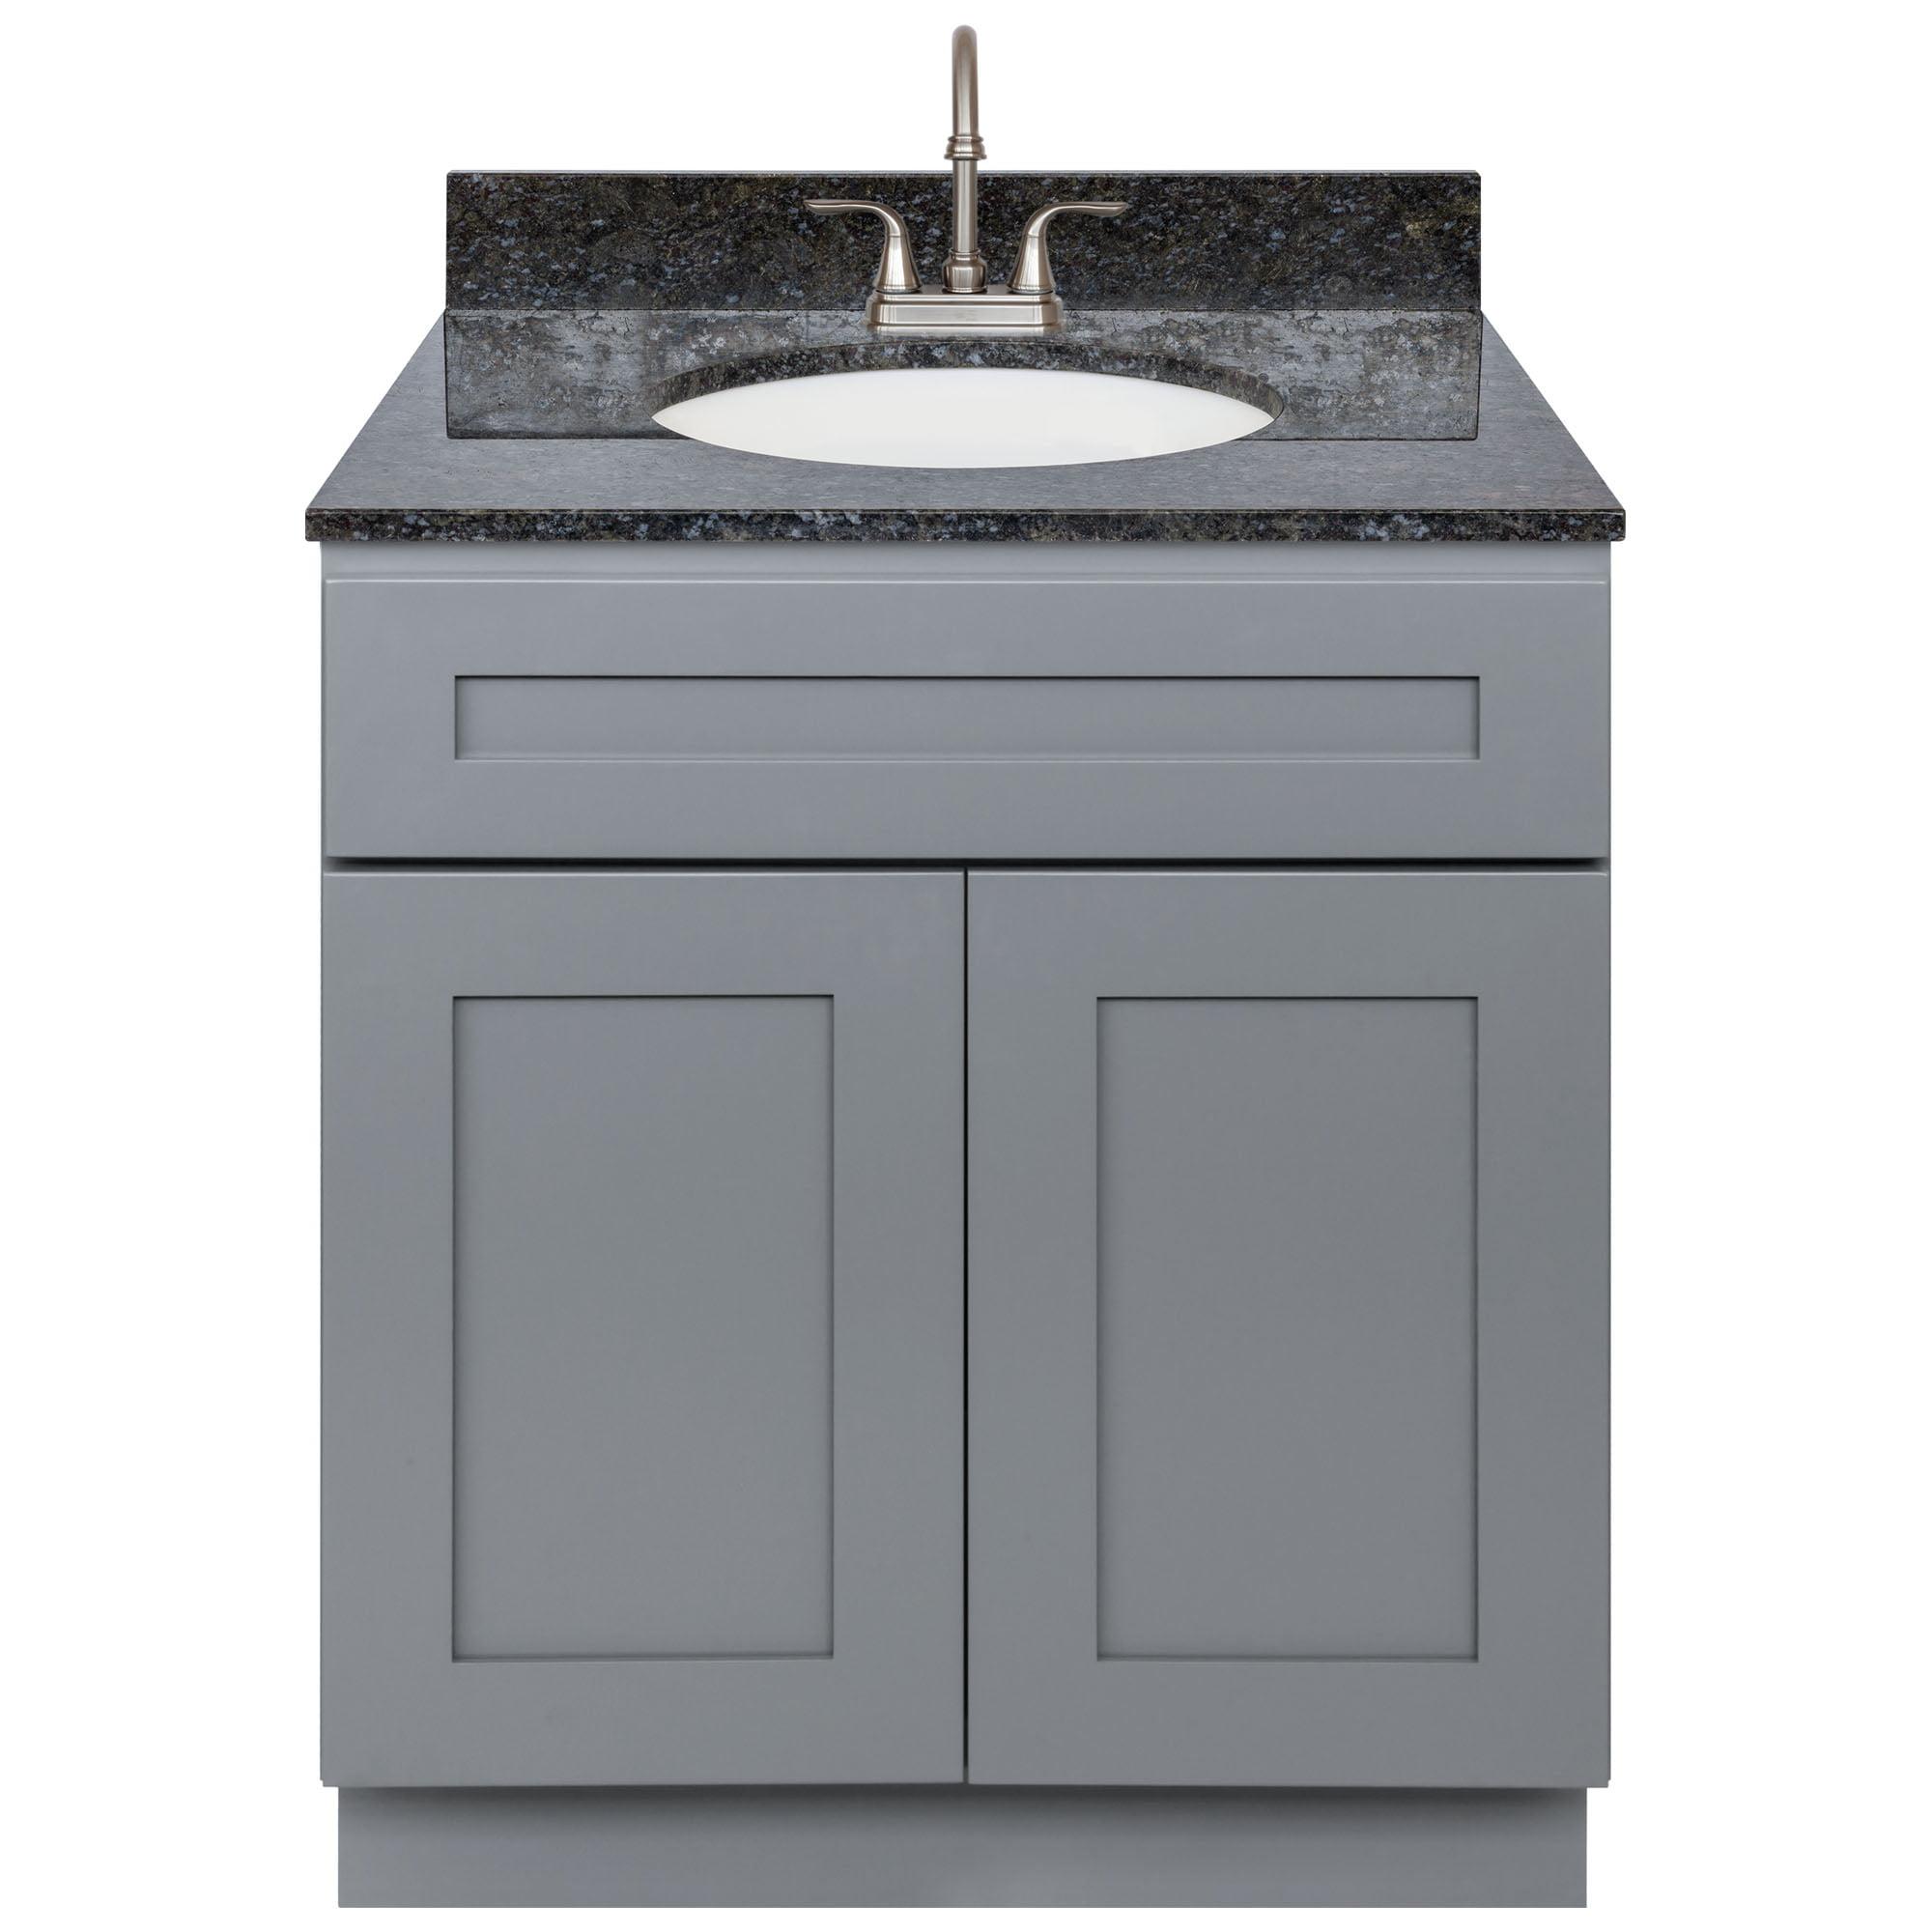 Cherry Bathroom Vanity 30 Blue Butterfly Granite Top Faucet Lb6b Walmart Com Walmart Com